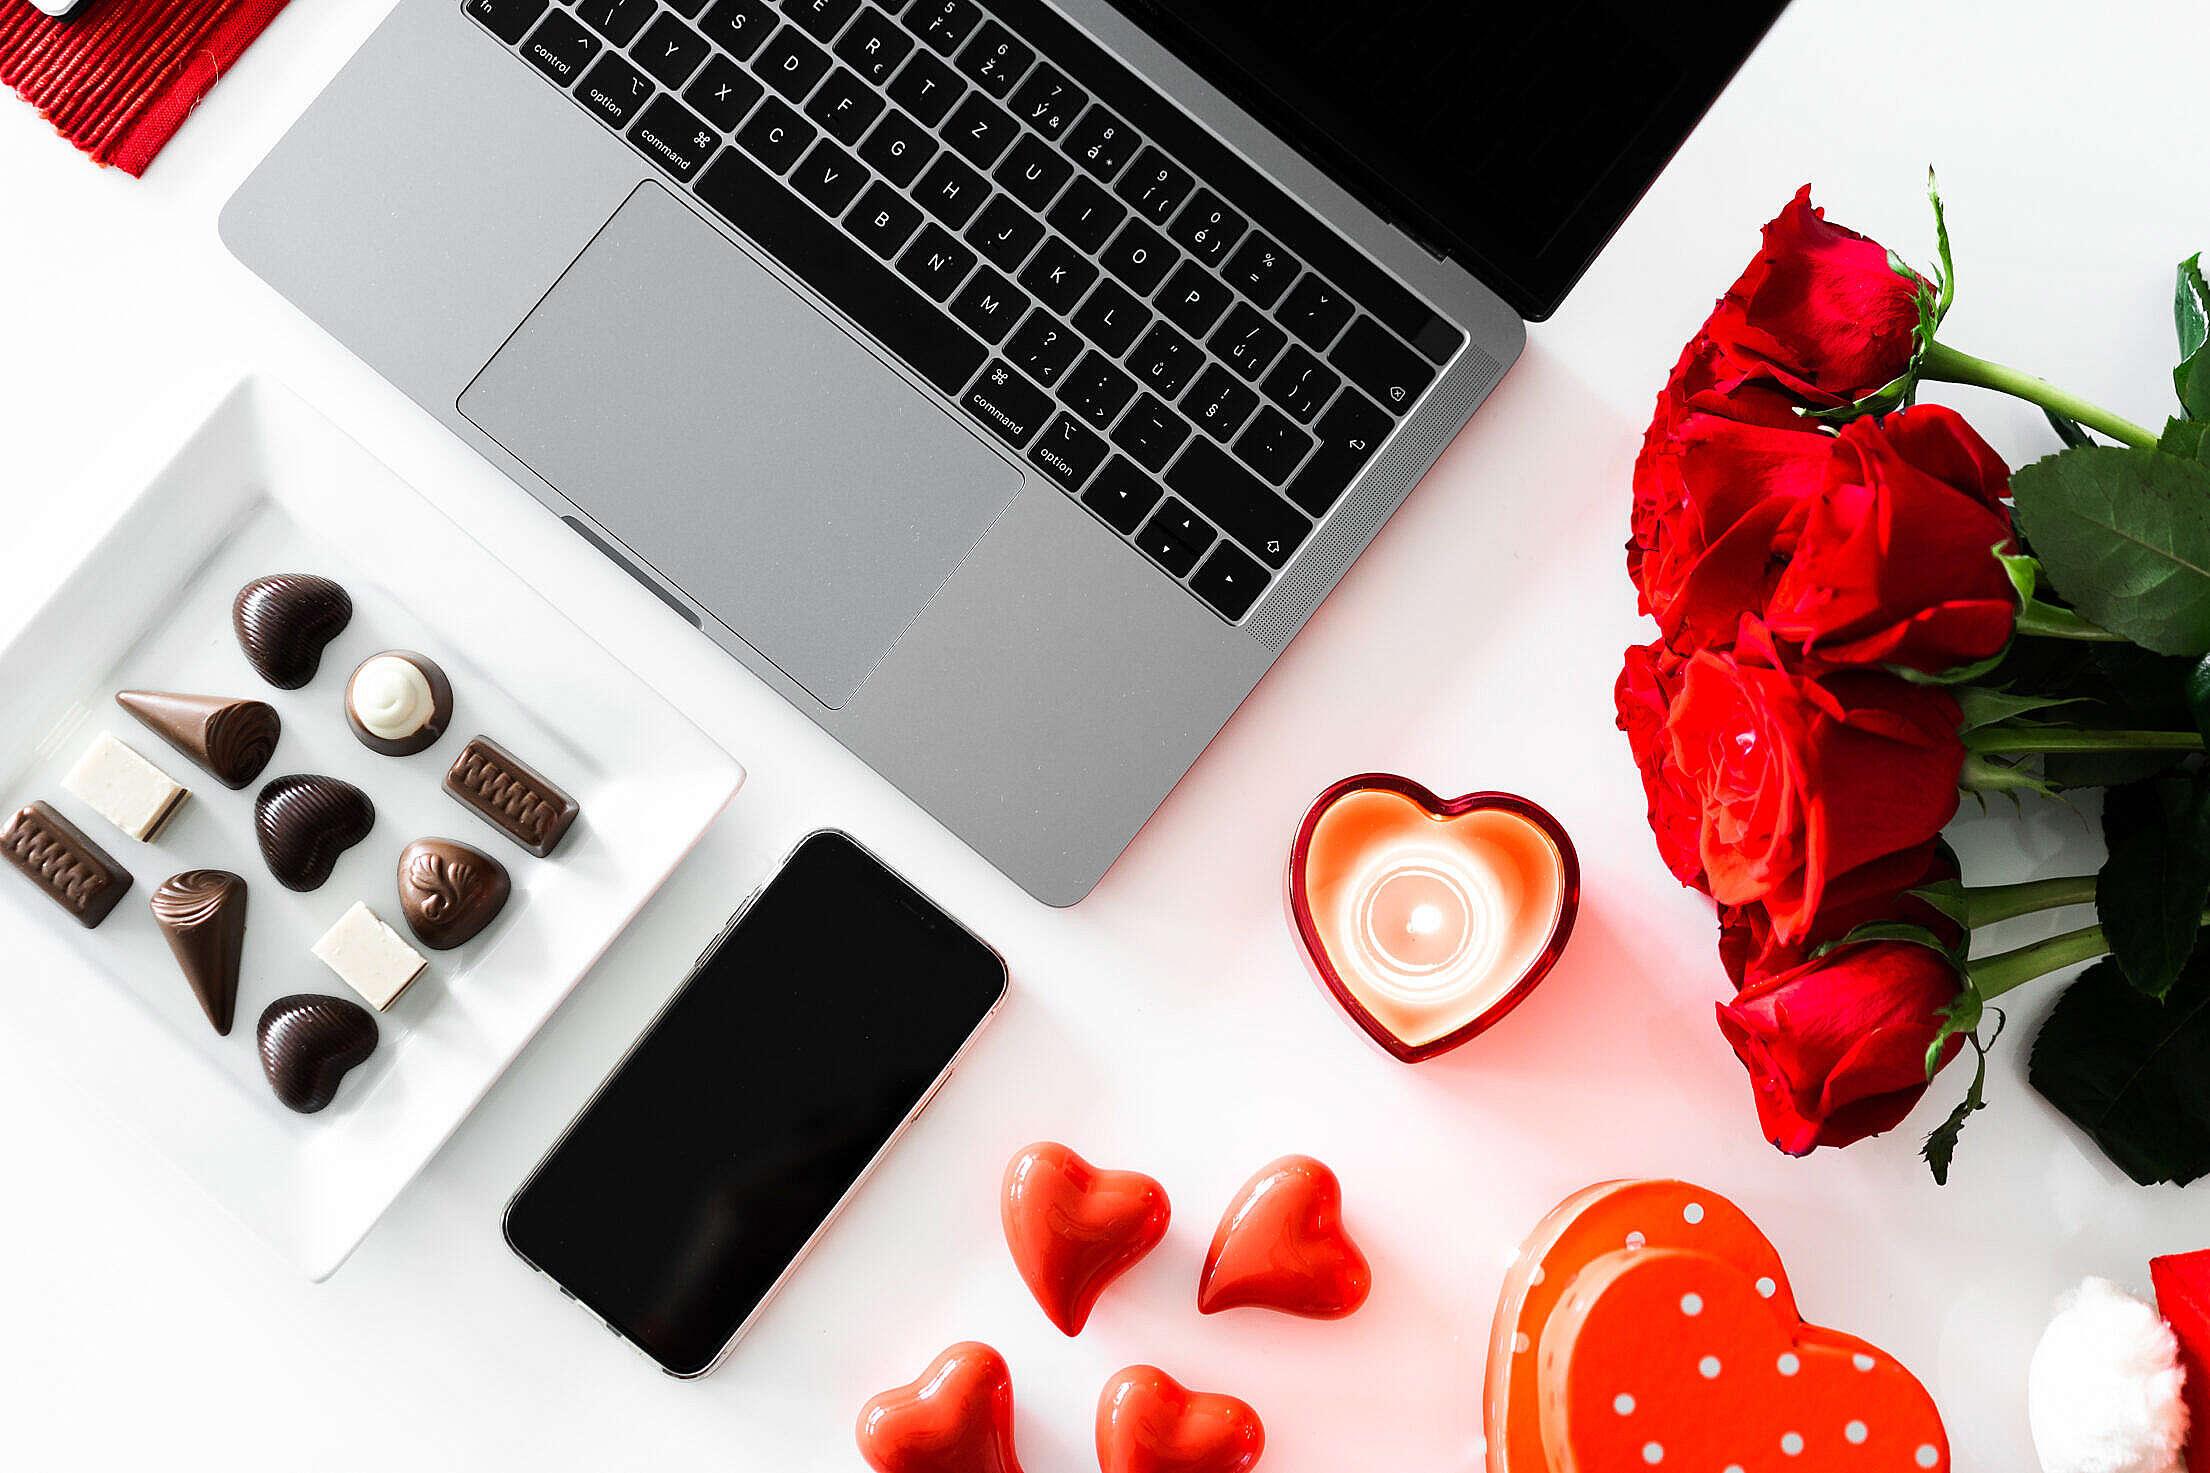 Valentine's Day Marketing Free Stock Photo